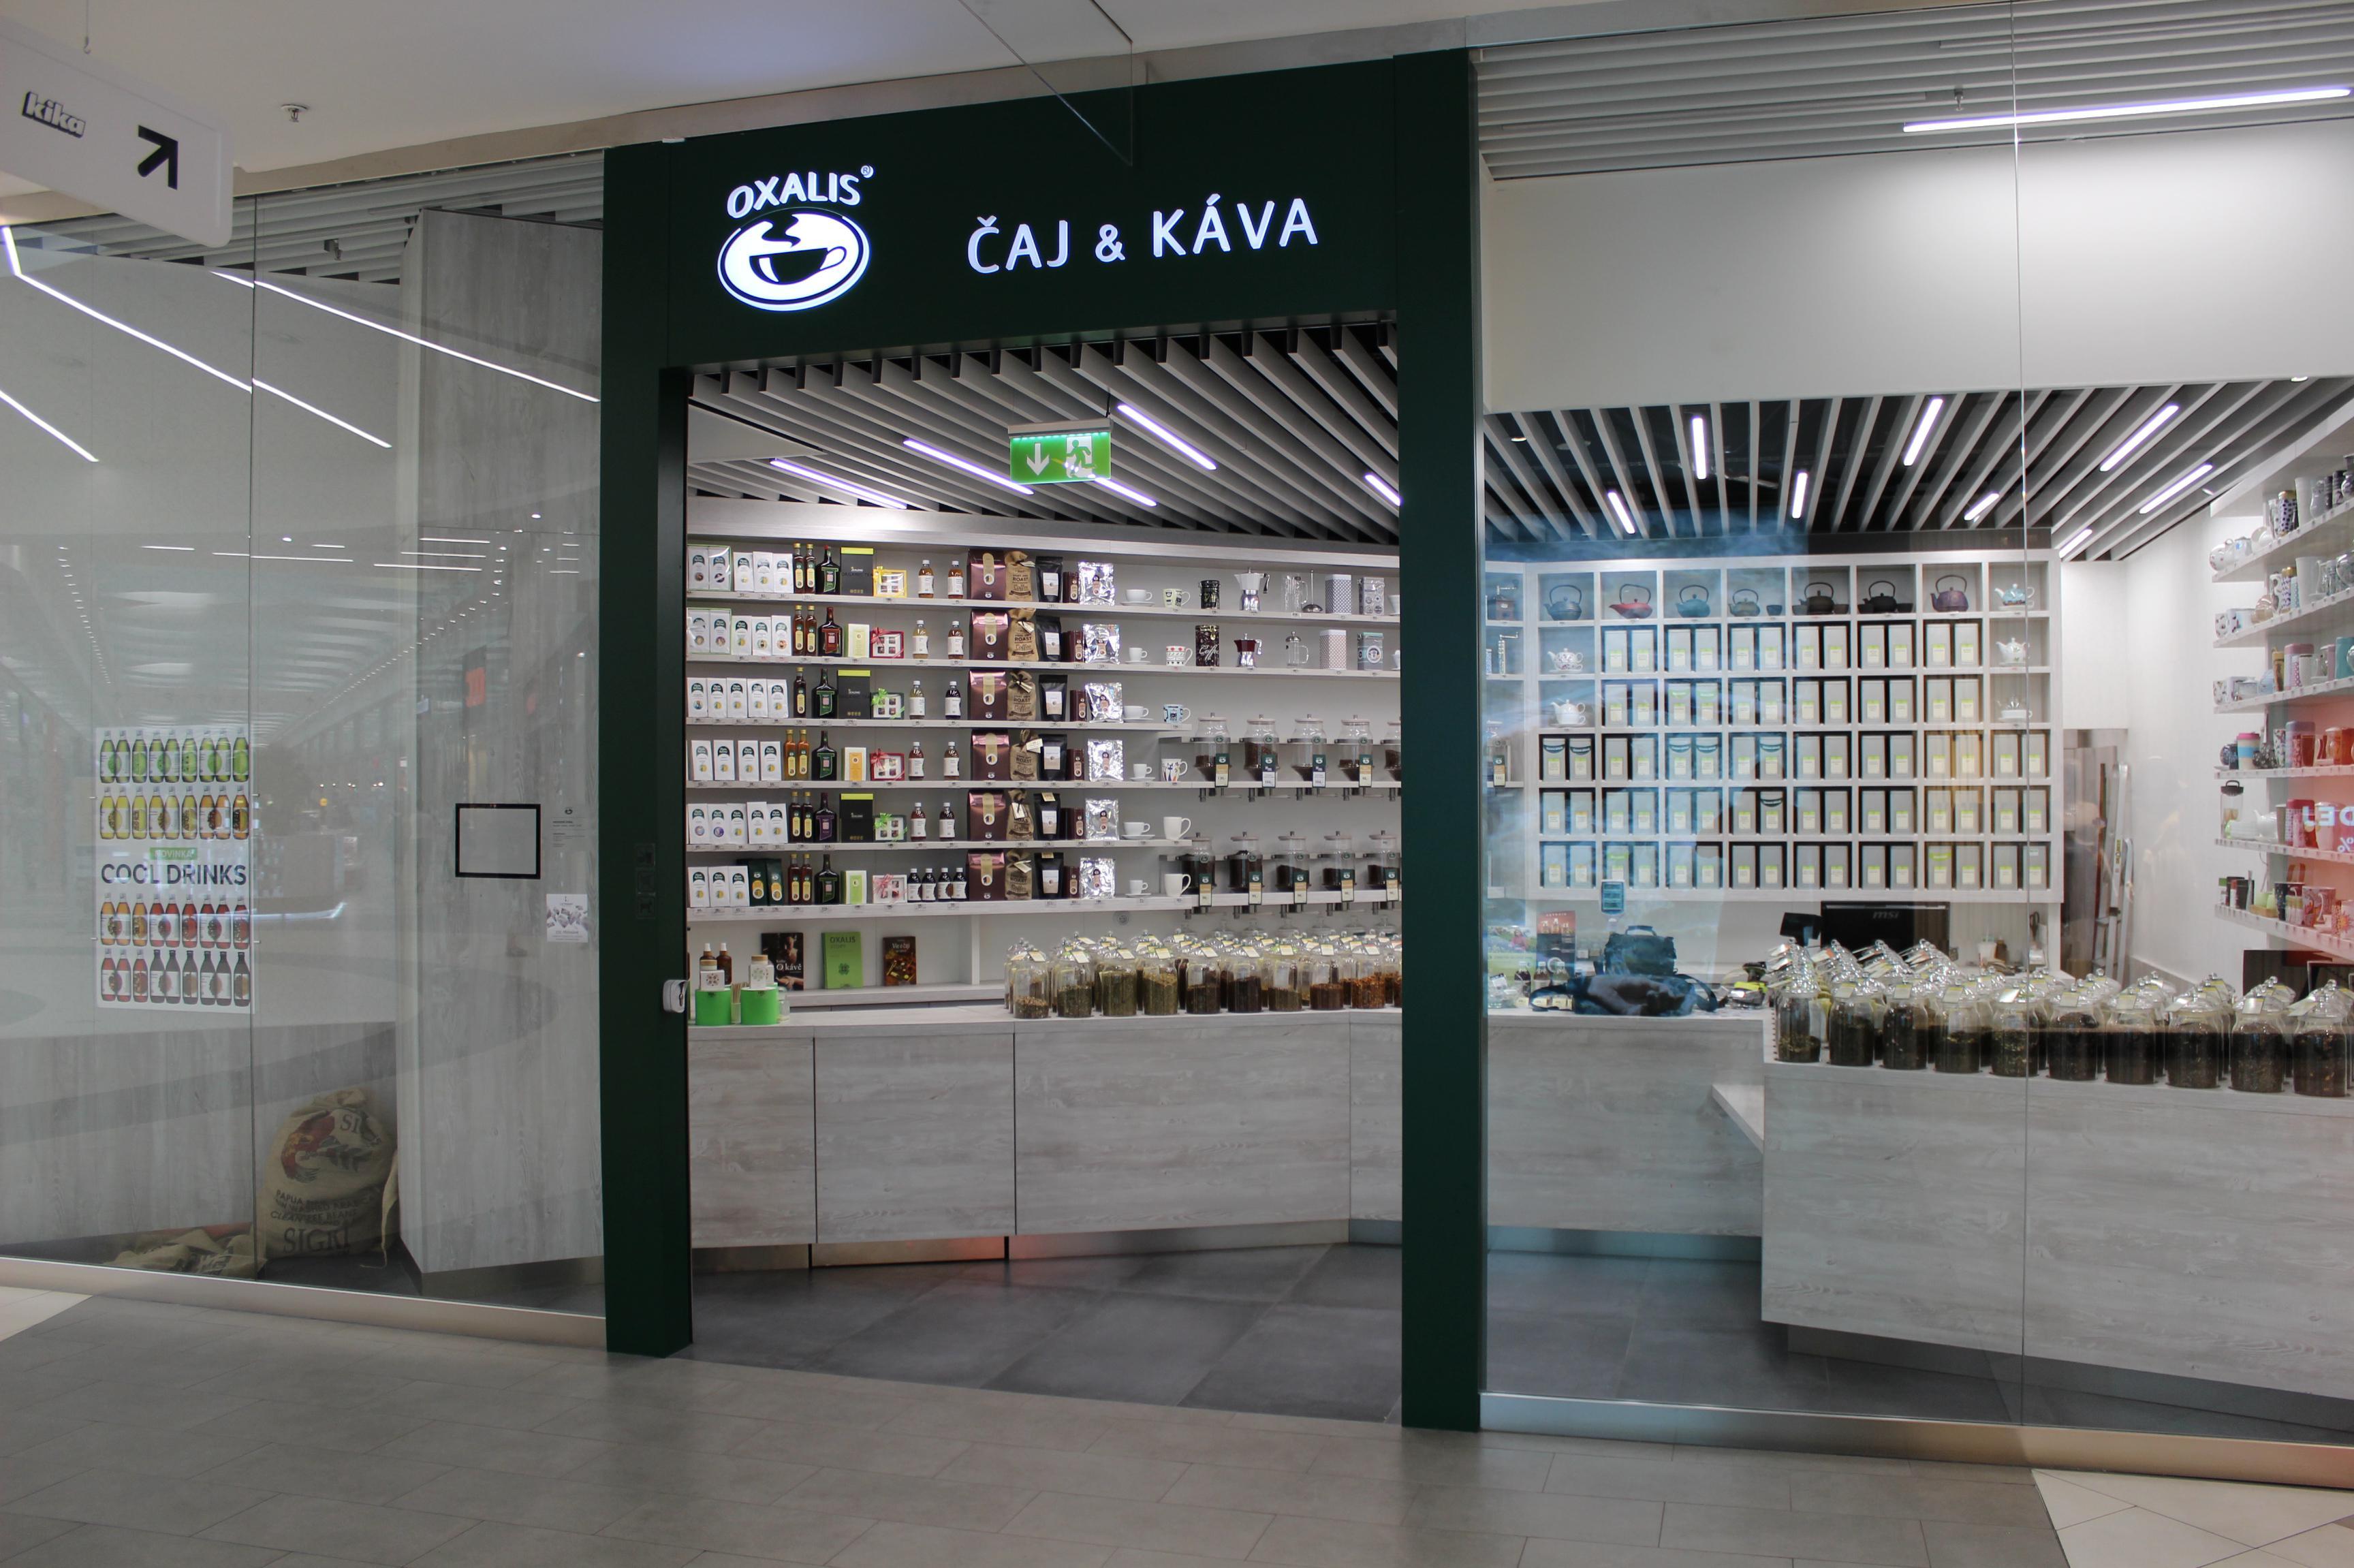 výroba kávy 100 bezplatných seznamovacích webů Asie